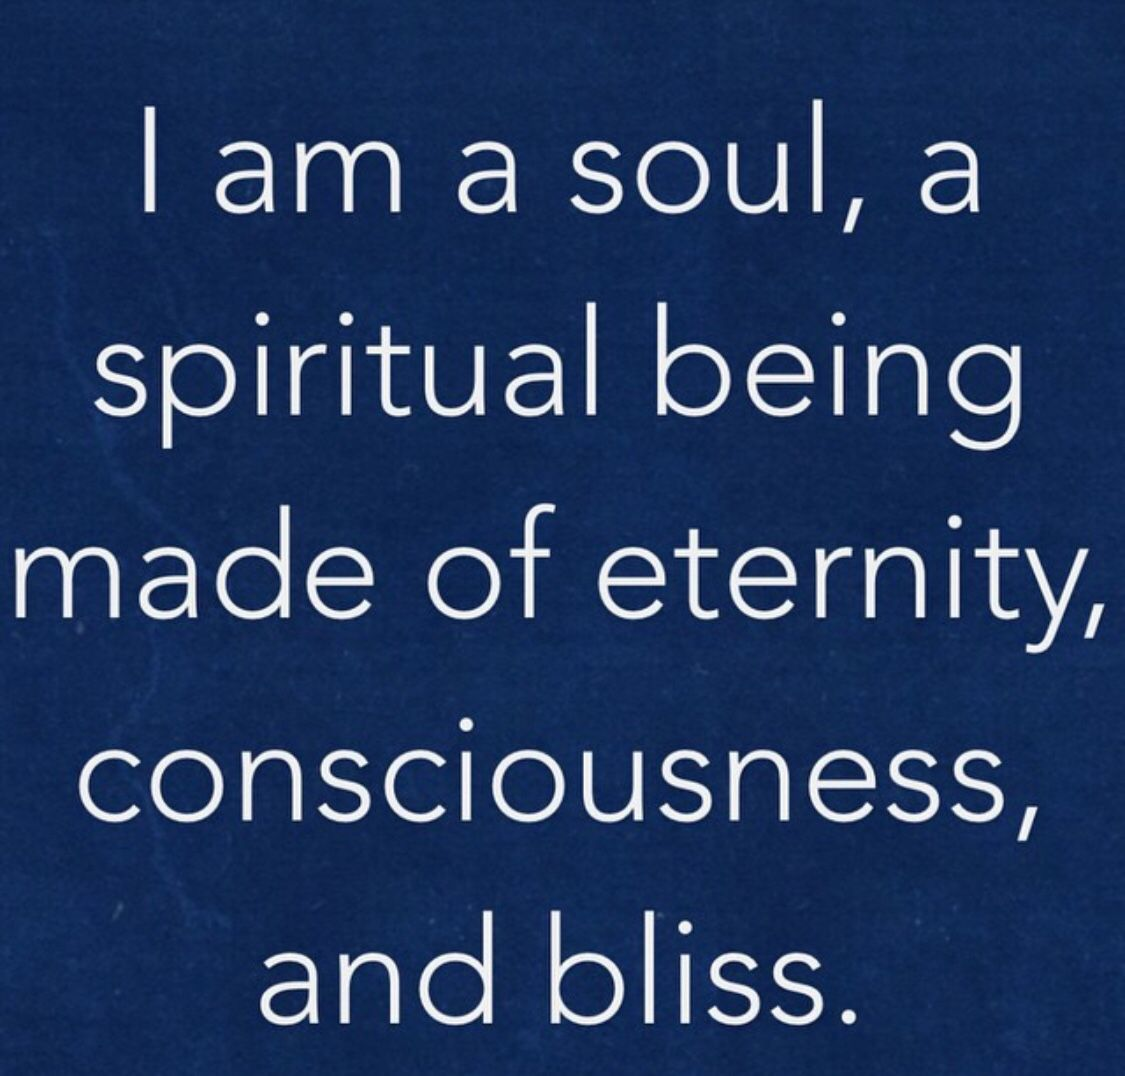 I am a soul a spiritual being......❤️☀️